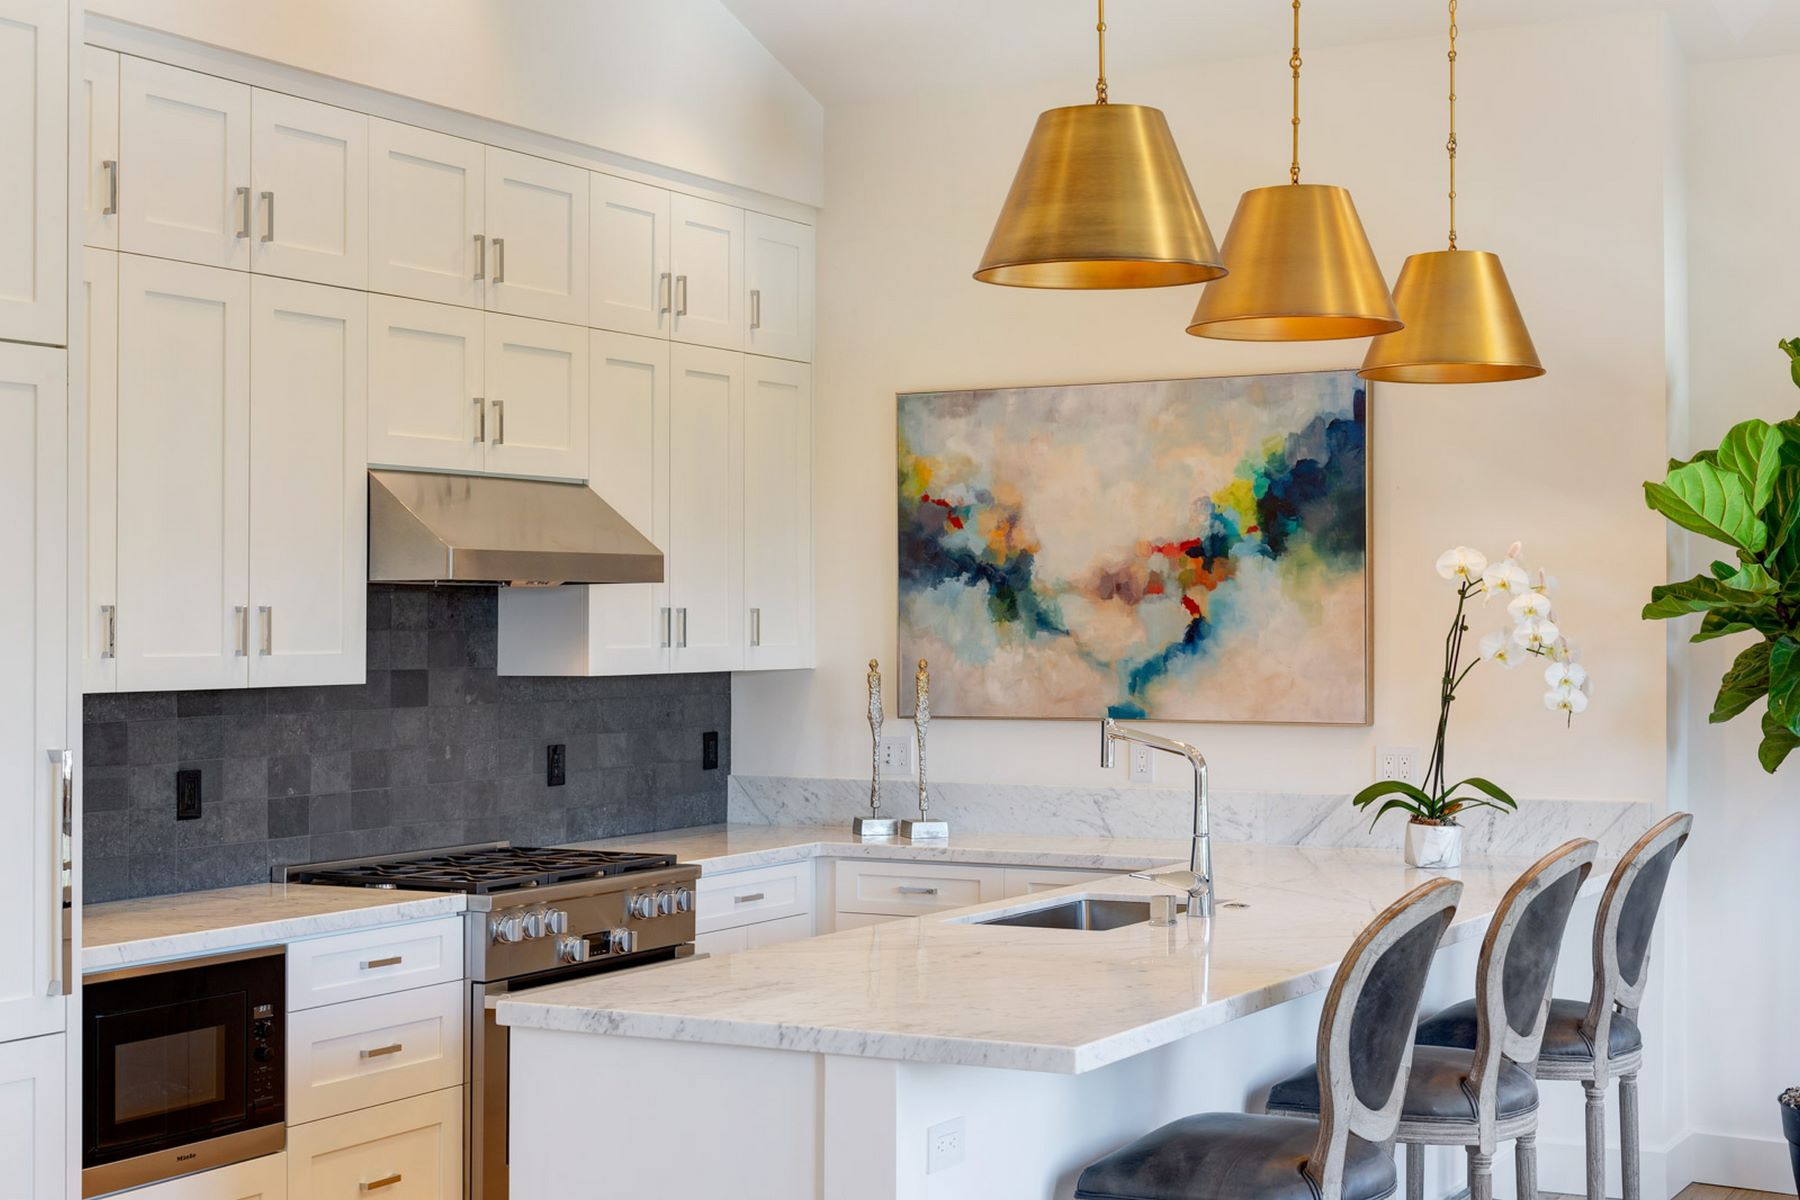 townhouses pour l Vente à Brand New Modern Contemporary Town Home - Ideal Location 39 Crescent Avenue, Sausalito, Californie 94965 États-Unis